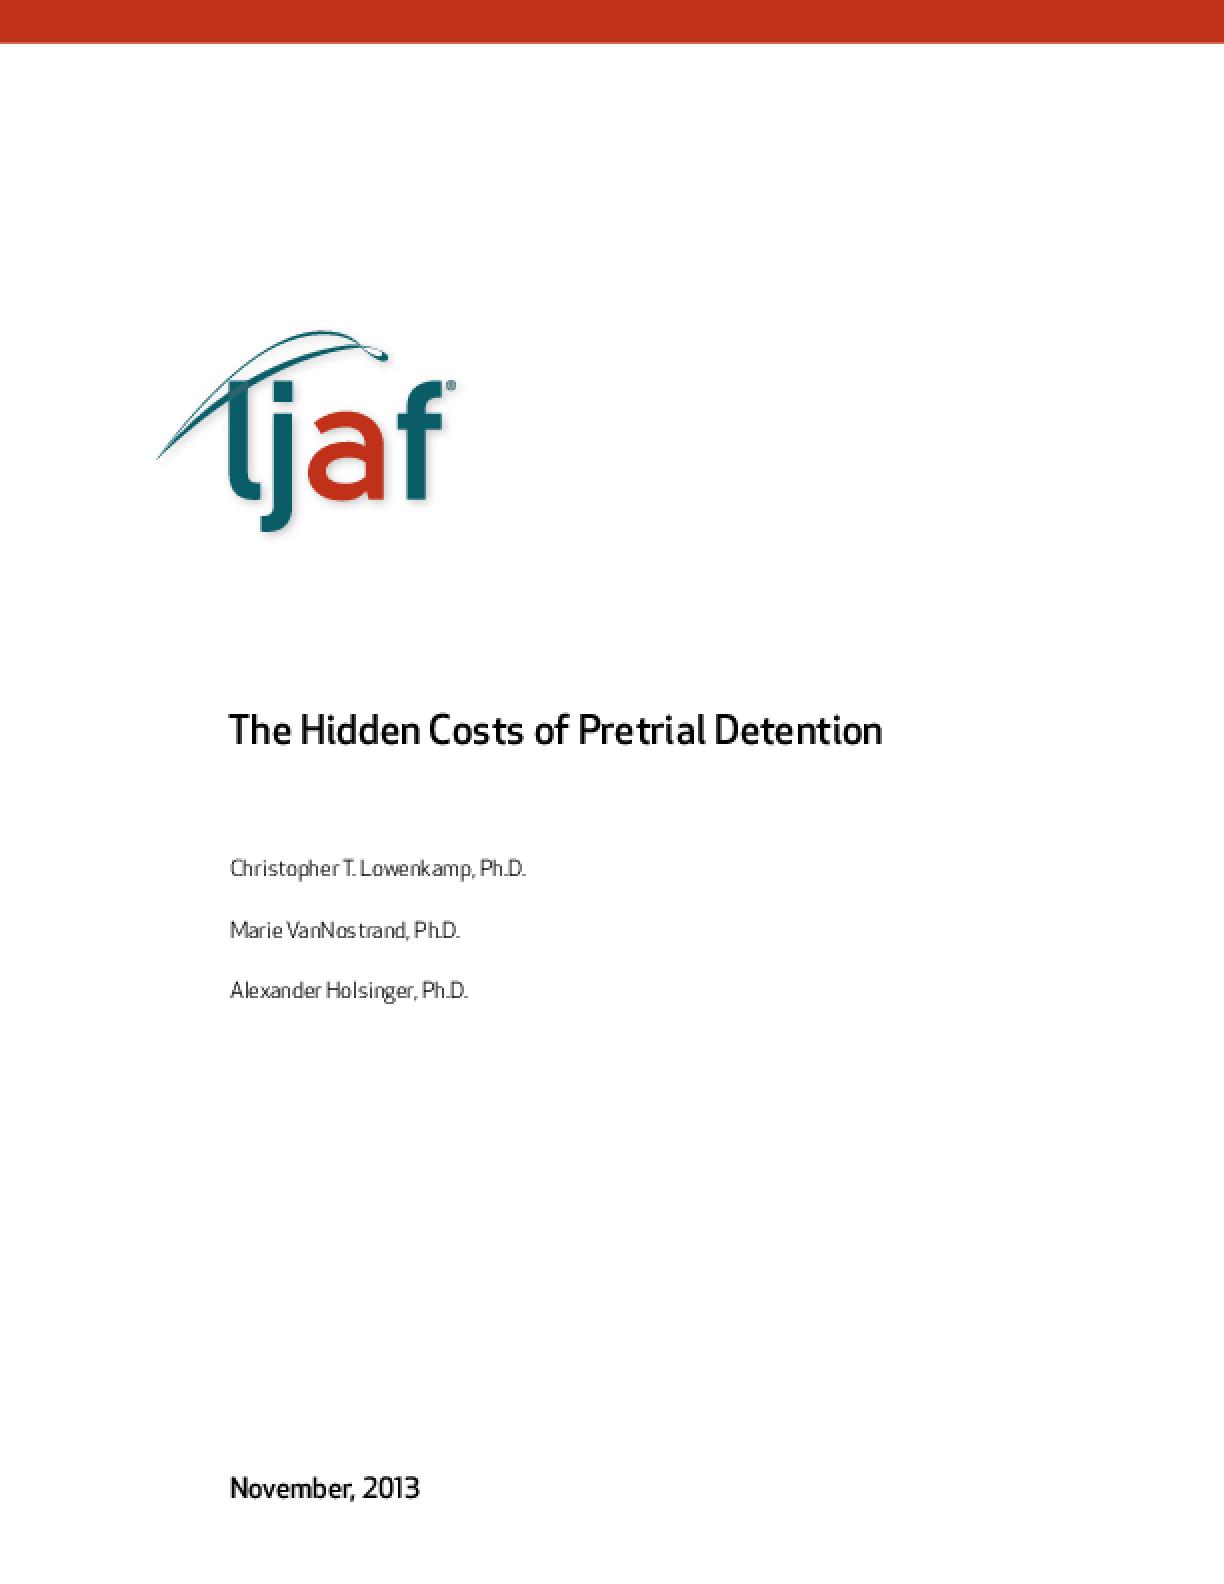 The Hidden Costs of Pretrial Detention